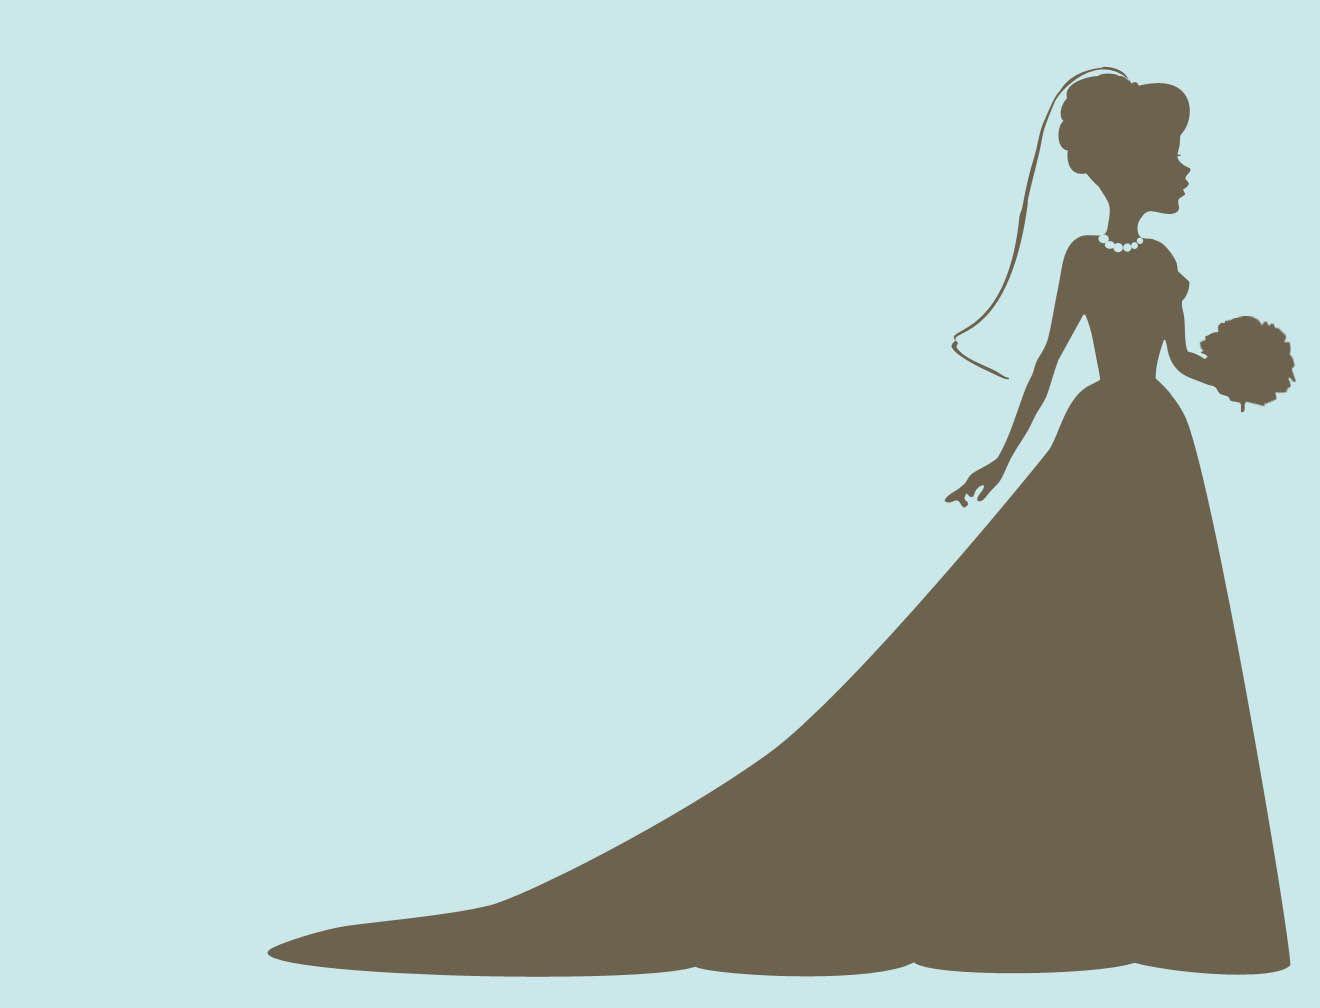 Bridal Shower Invitations | Free Printable Bridal Shower Invitations - Free Printable Bridal Shower Invitations Templates